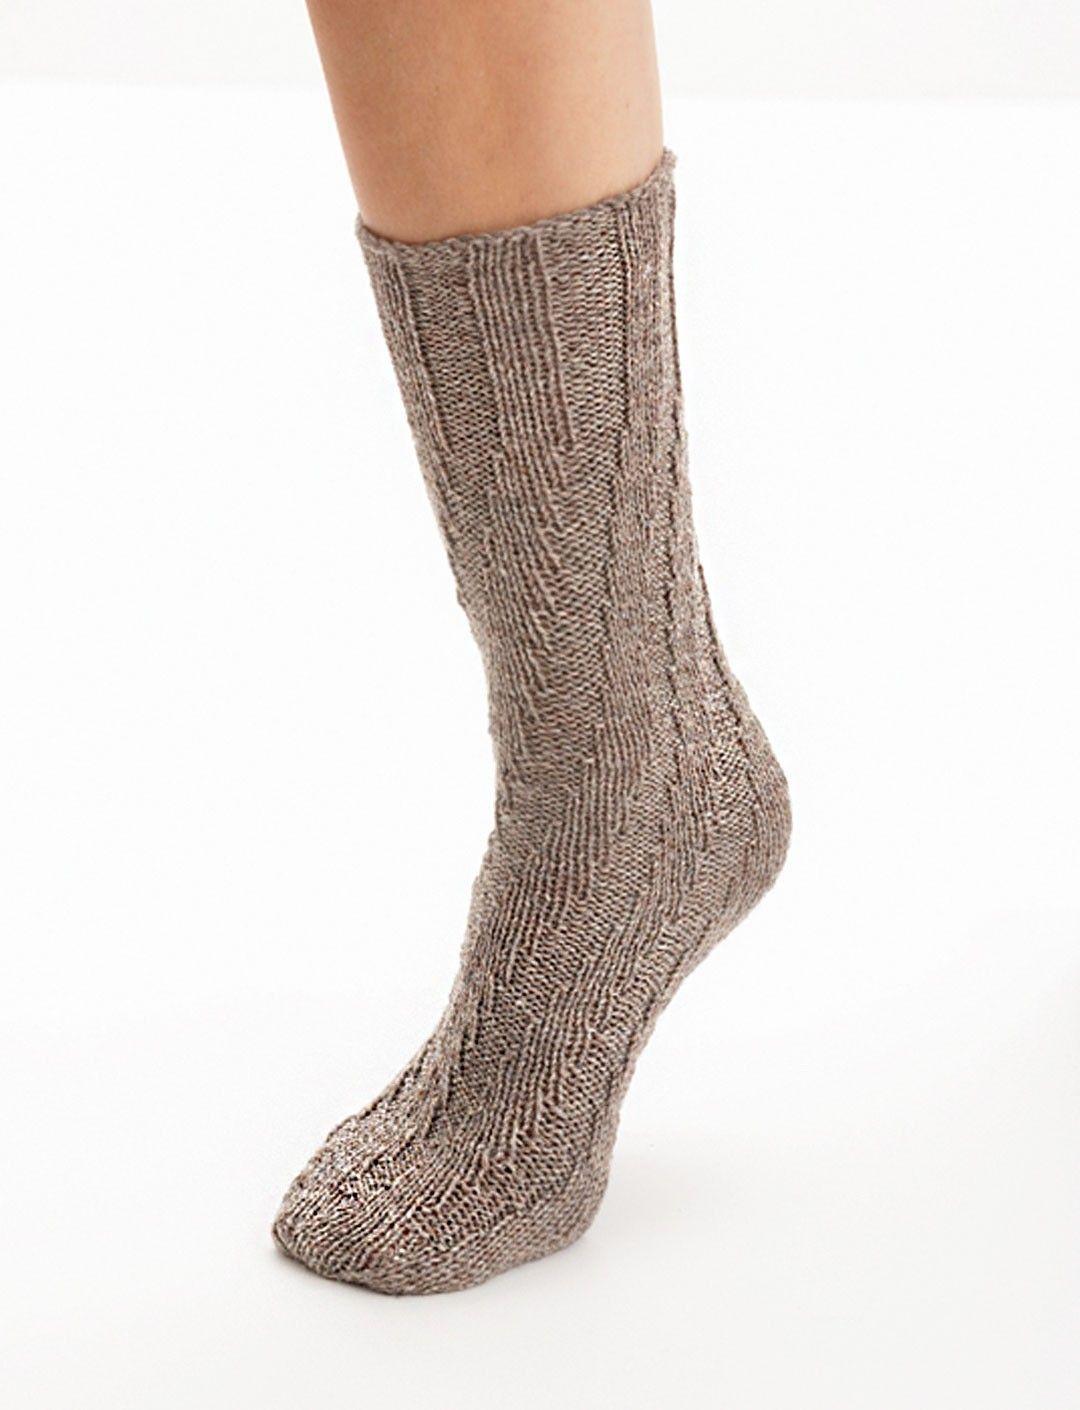 Yarnspirations.com - Patons Spiral Socks - Patterns | Yarnspirations ...